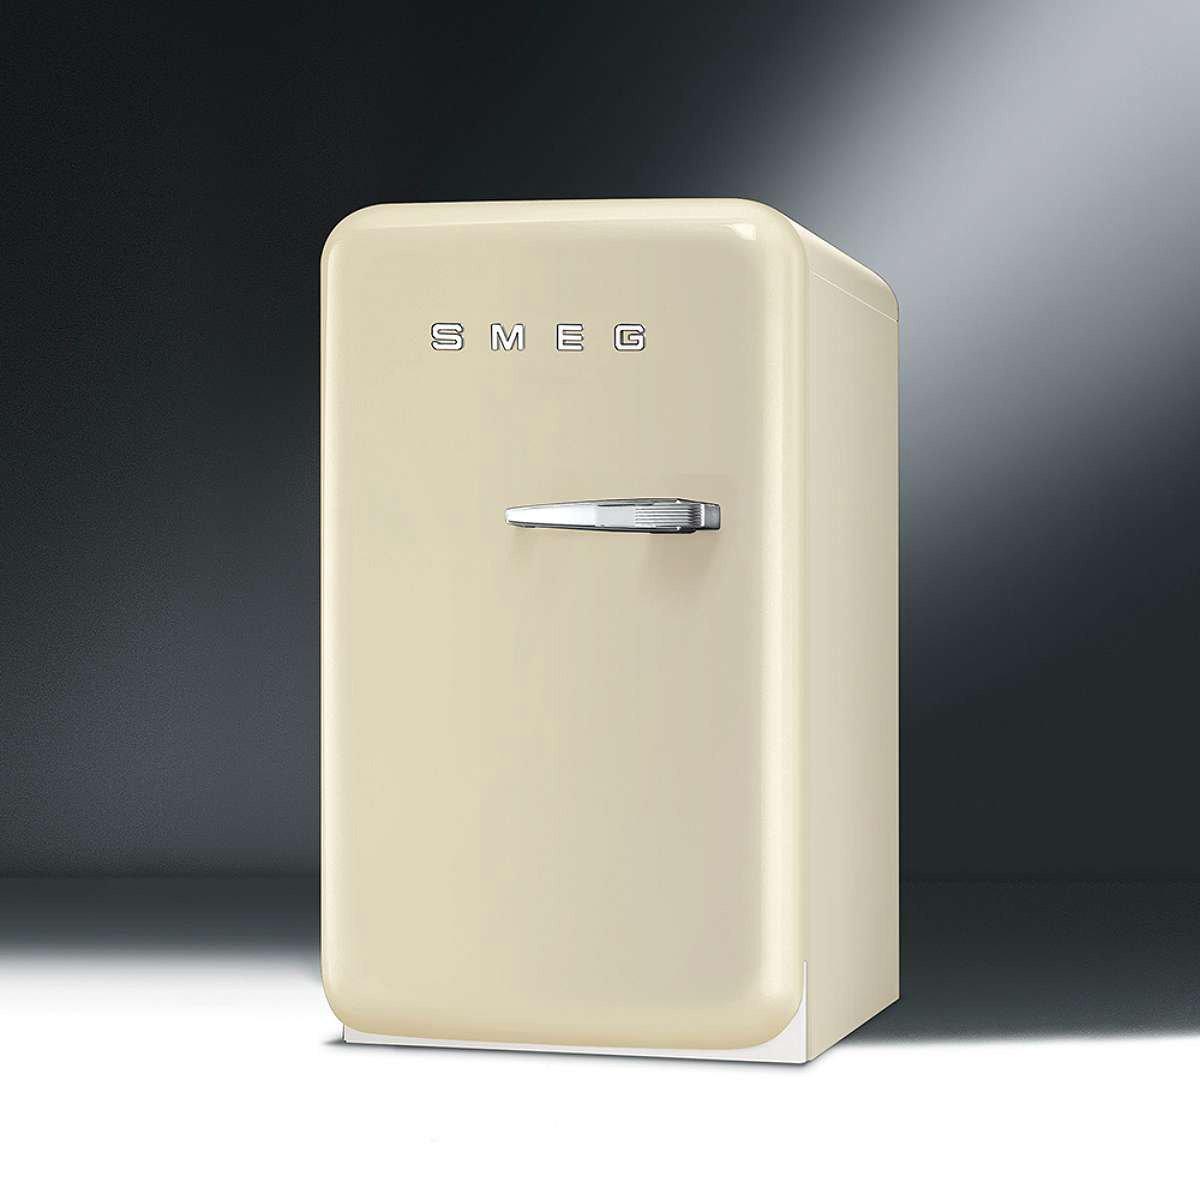 Smeg '50s Style Mini Refrigerator - The Green Head